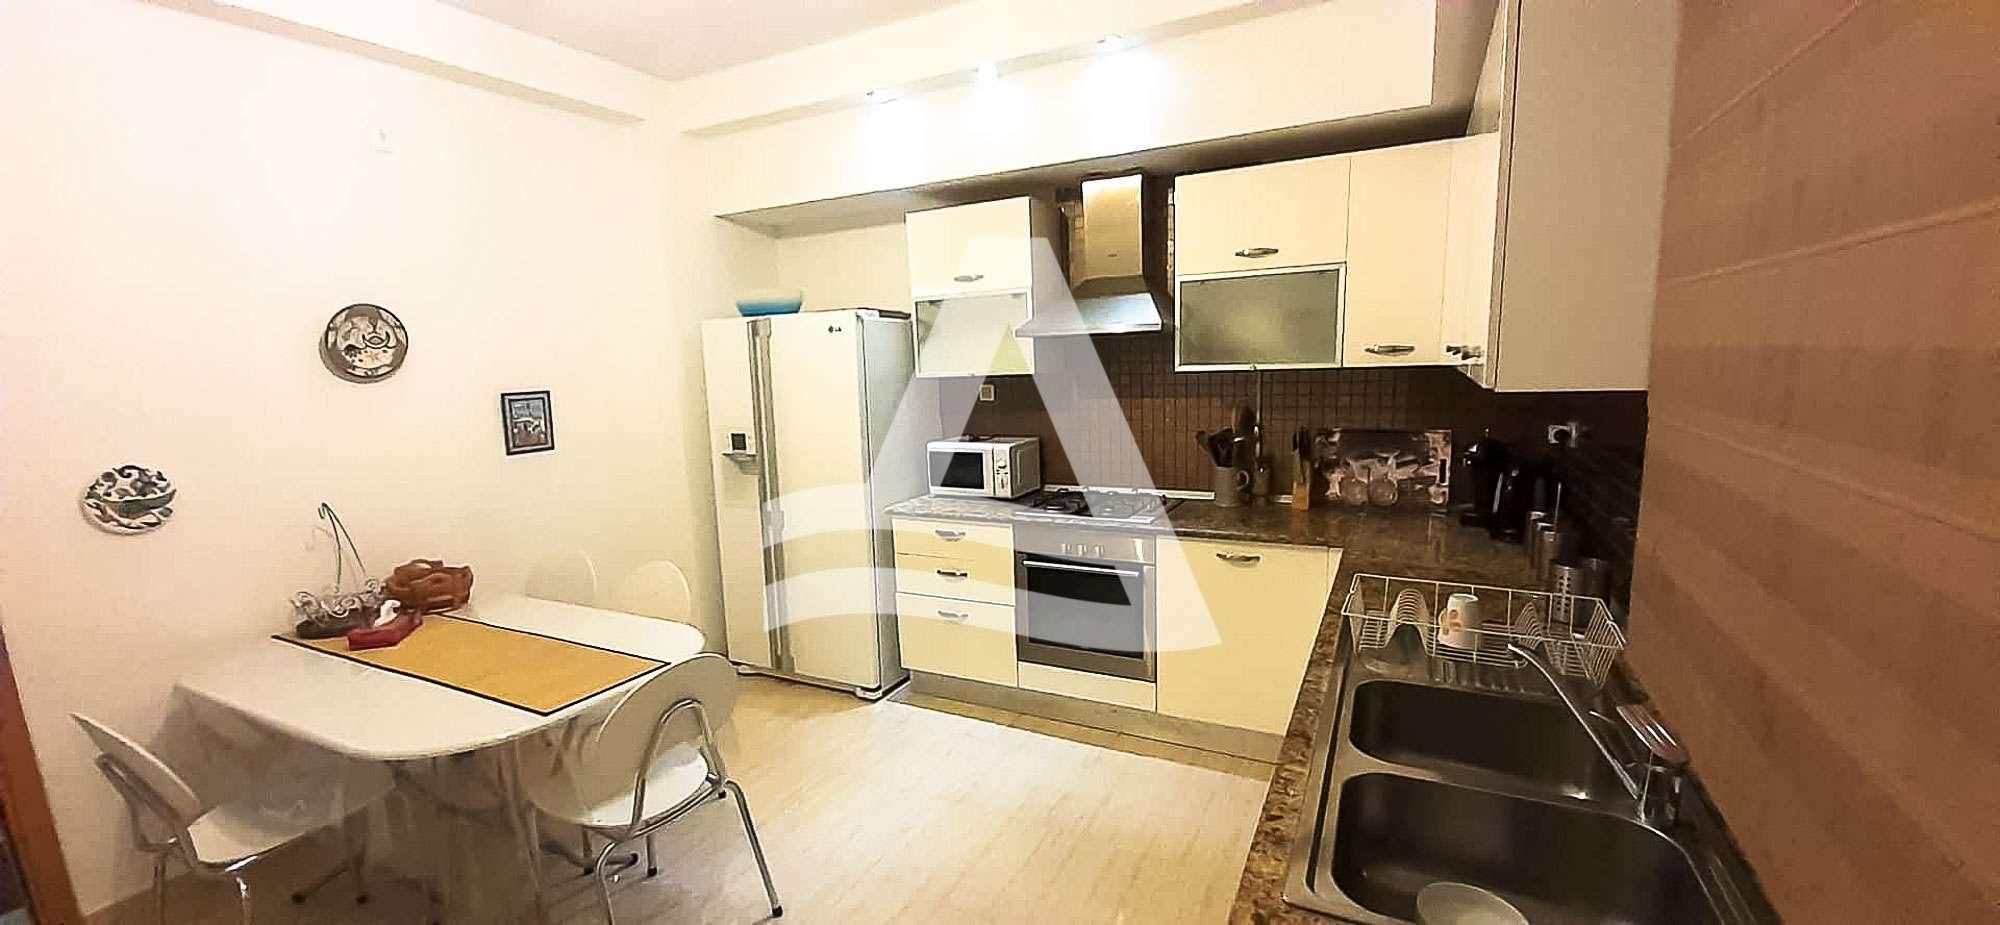 httpss3.amazonaws.comlogimoaws_Arcane_immobilière_la_Marsa-_location_-_vente_la_marsa_11_sur_12_1574867274177